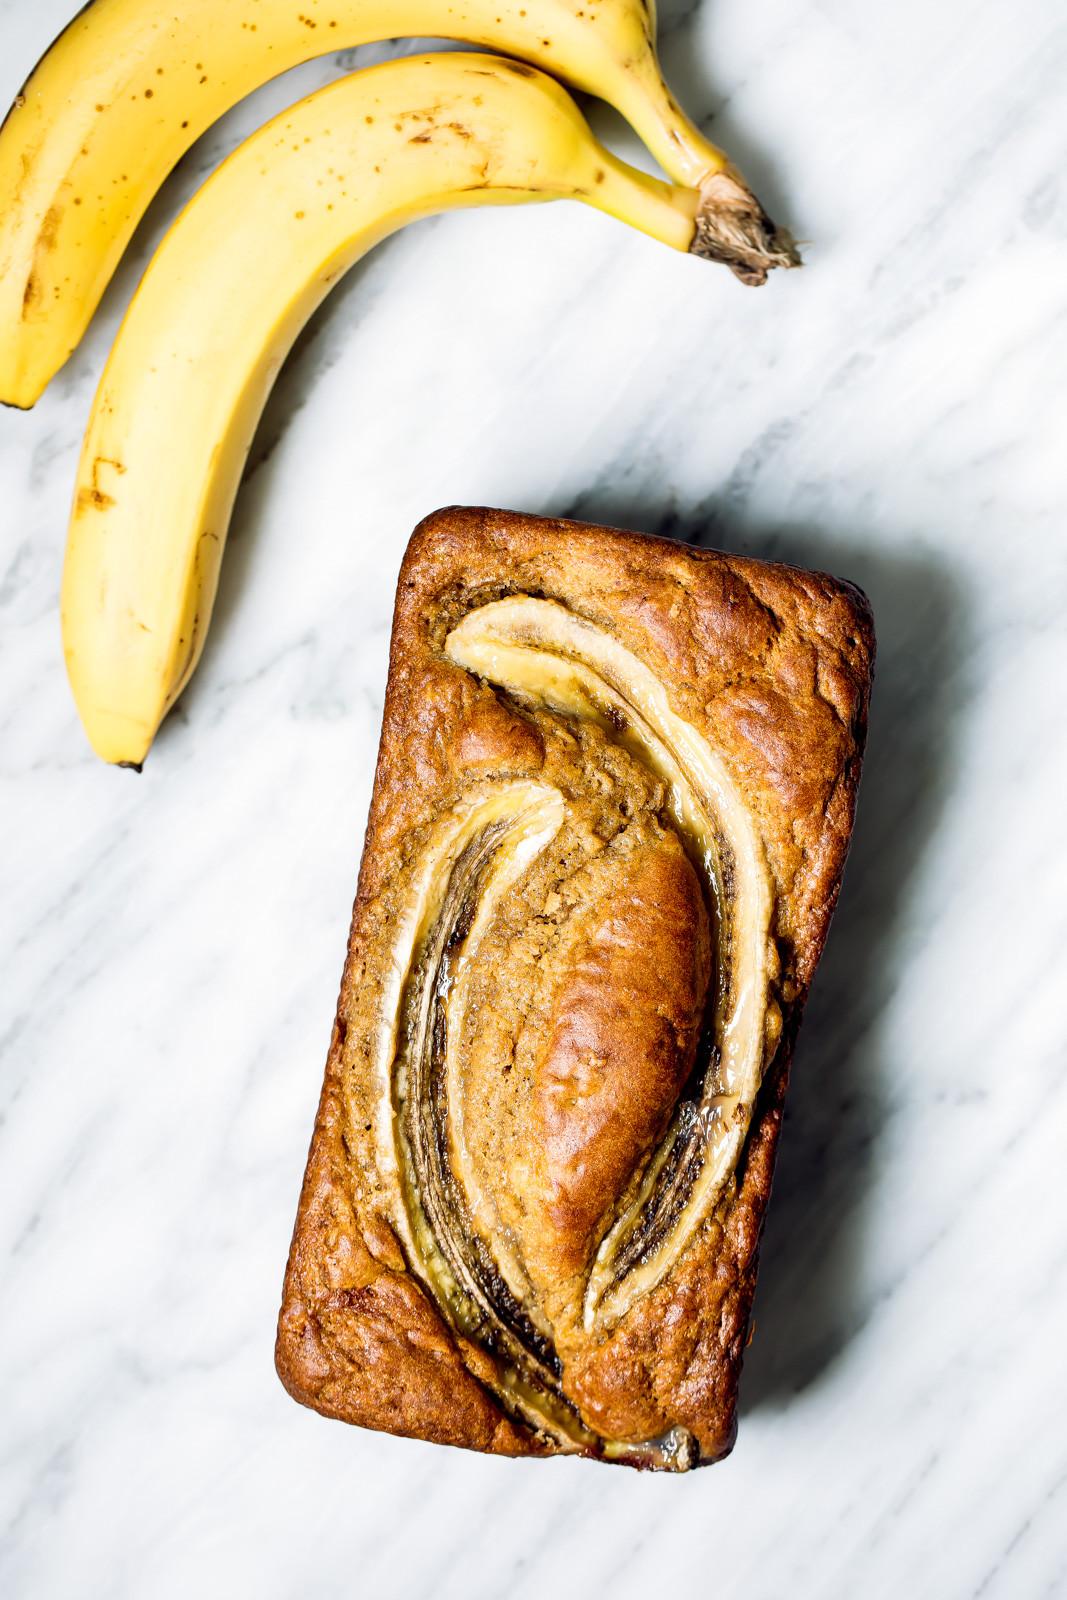 Healthy Banan Bread  My Favorite Healthy Banana Bread Recipe why baking is